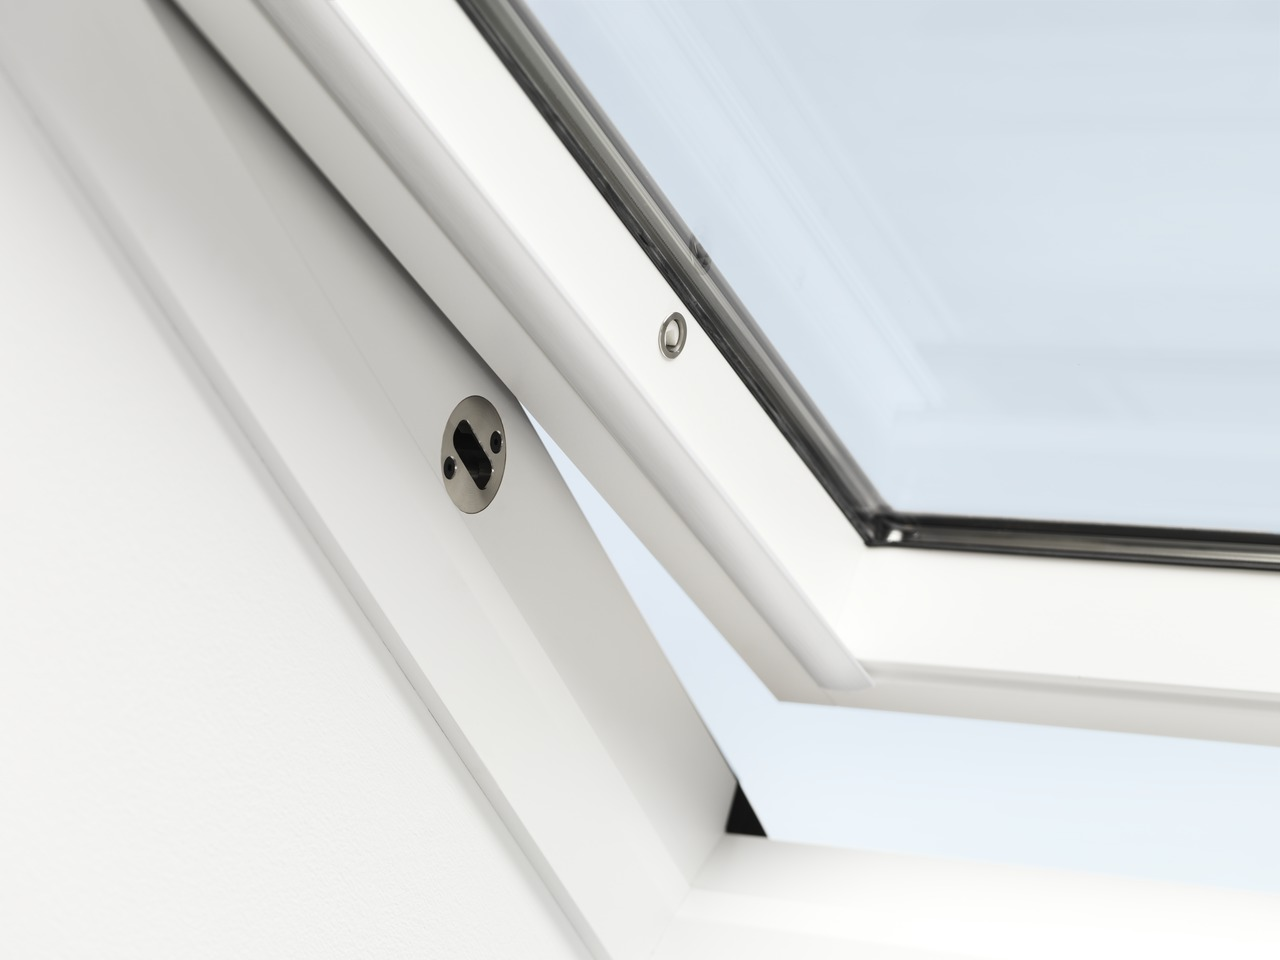 Finestre per tetti velux antieffrazione rivenditore velux for Velux lucernari